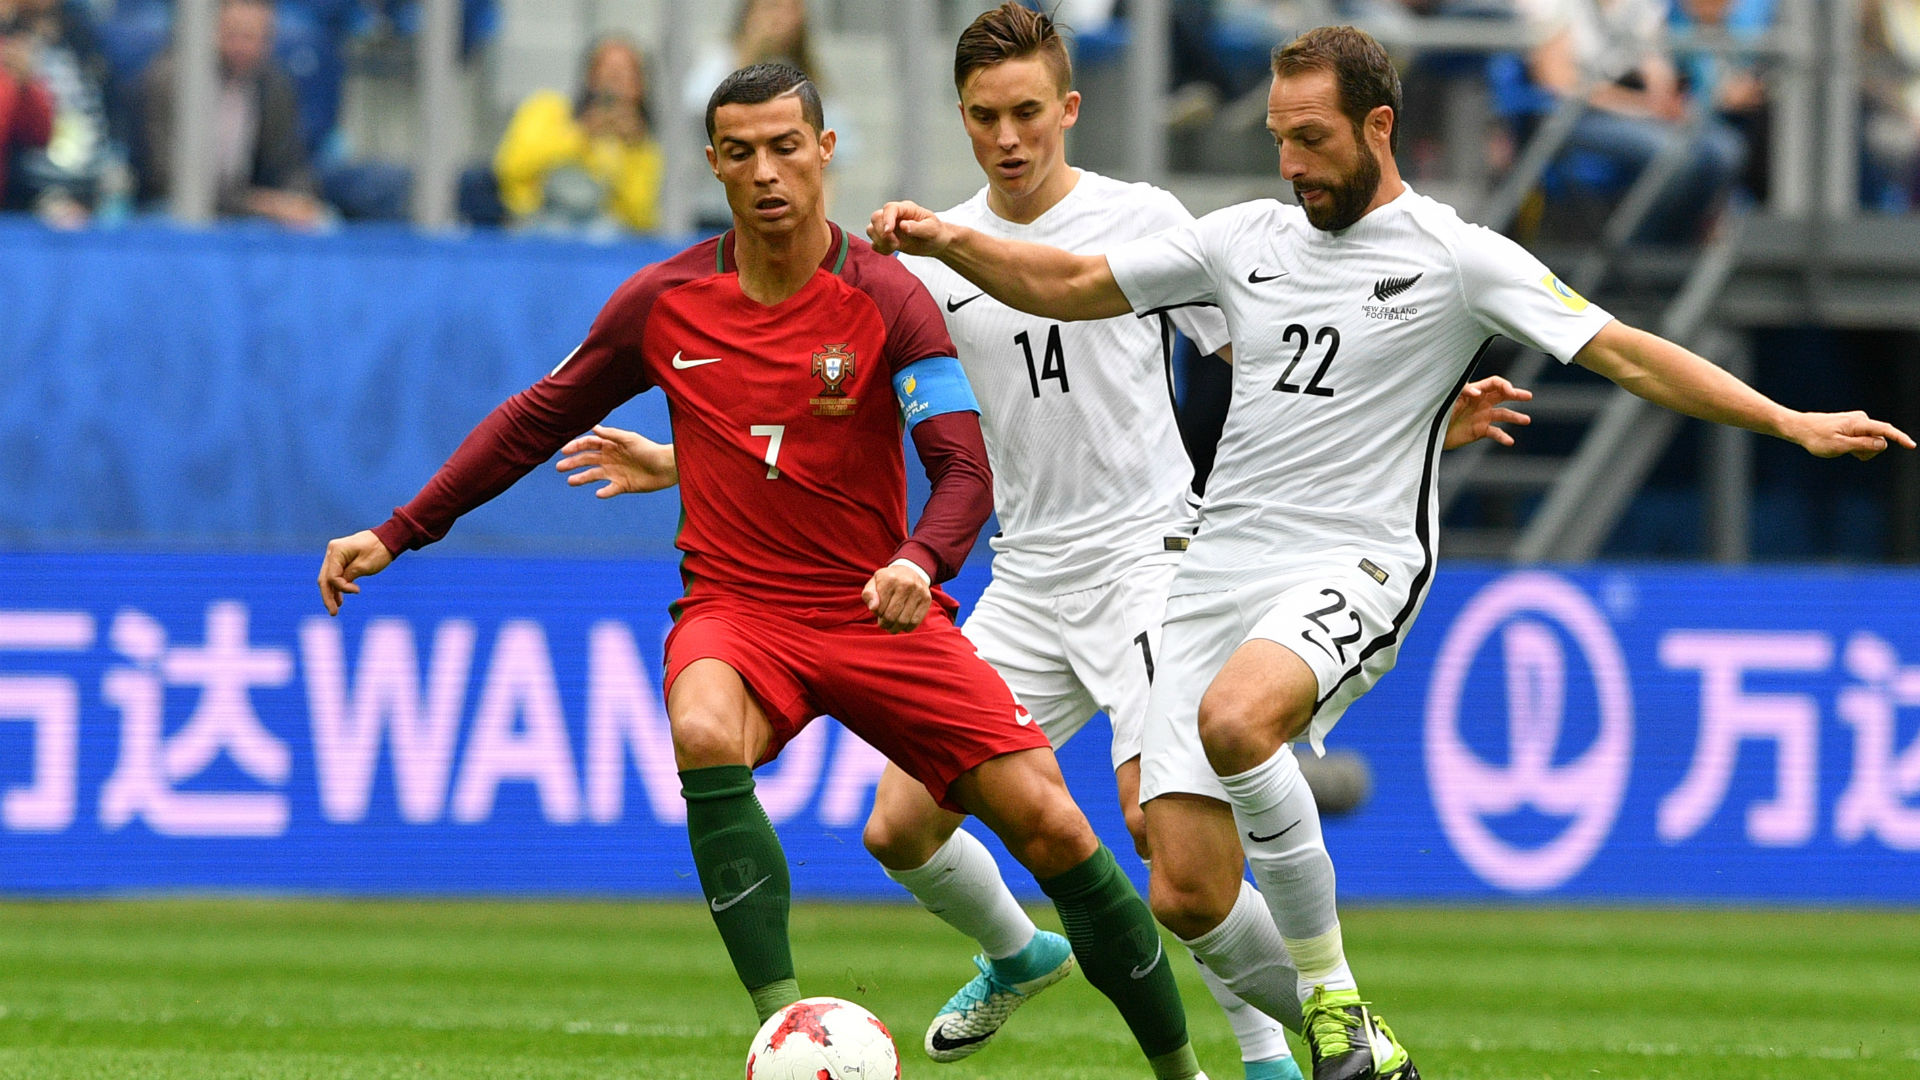 Cristiano Ronaldo Ryan Thomas Andrew Durante Portugal New Zealand Confederations Cup